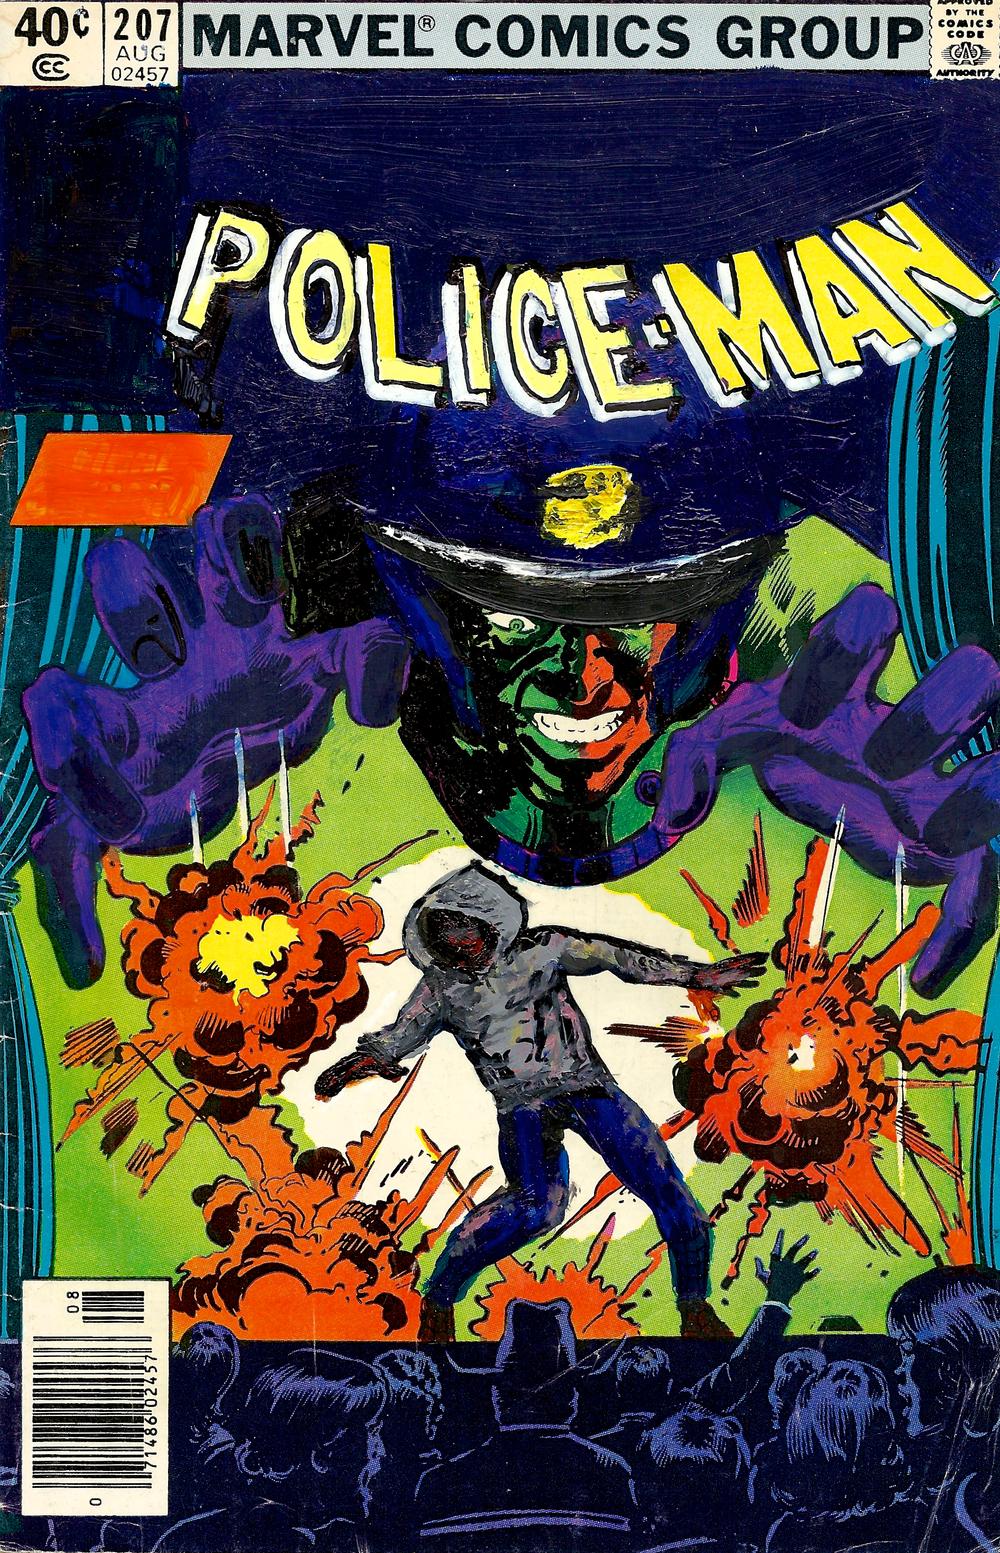 Police-Man #207